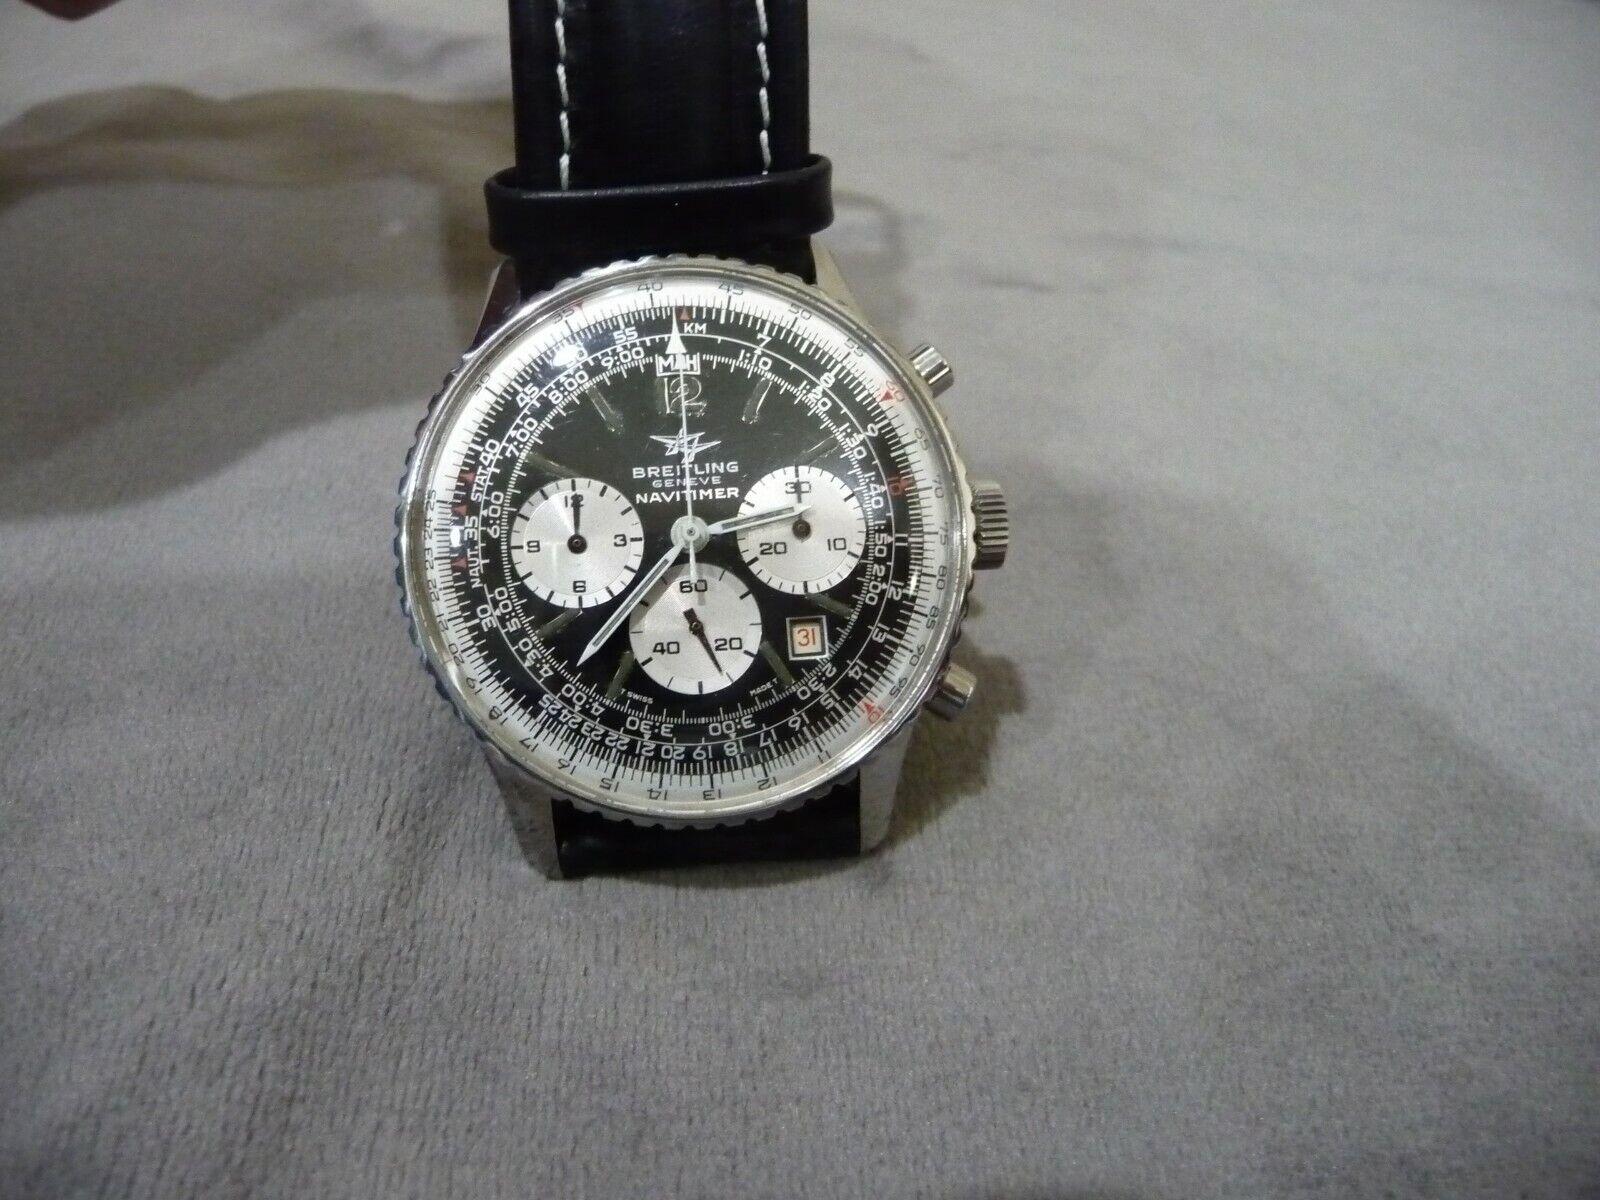 VINTAGE BREITLING NAVITIMER REF. 7806 ALL ORIGINAL SUPER NICE WATCH - watch picture 1